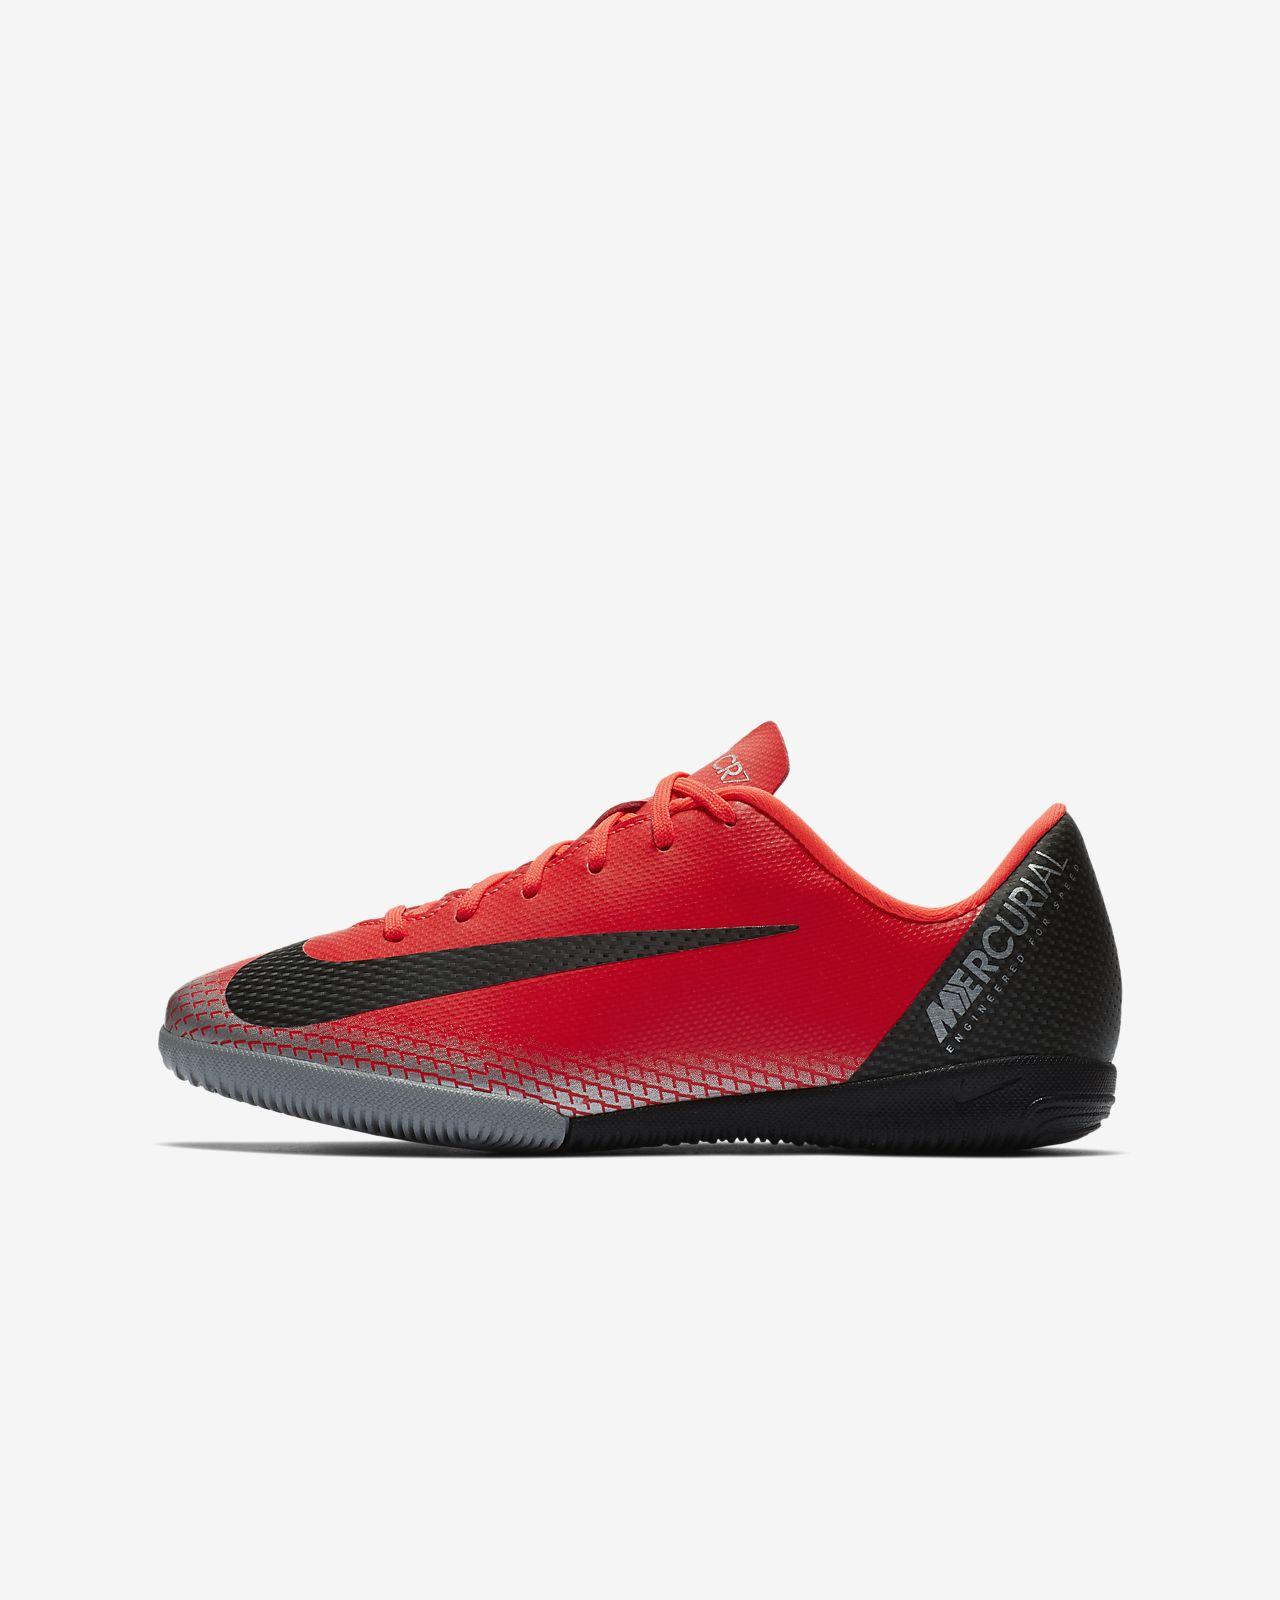 Nike Jr. MercurialX Vapor XII Academy CR7 小/大童室內球場足球鞋